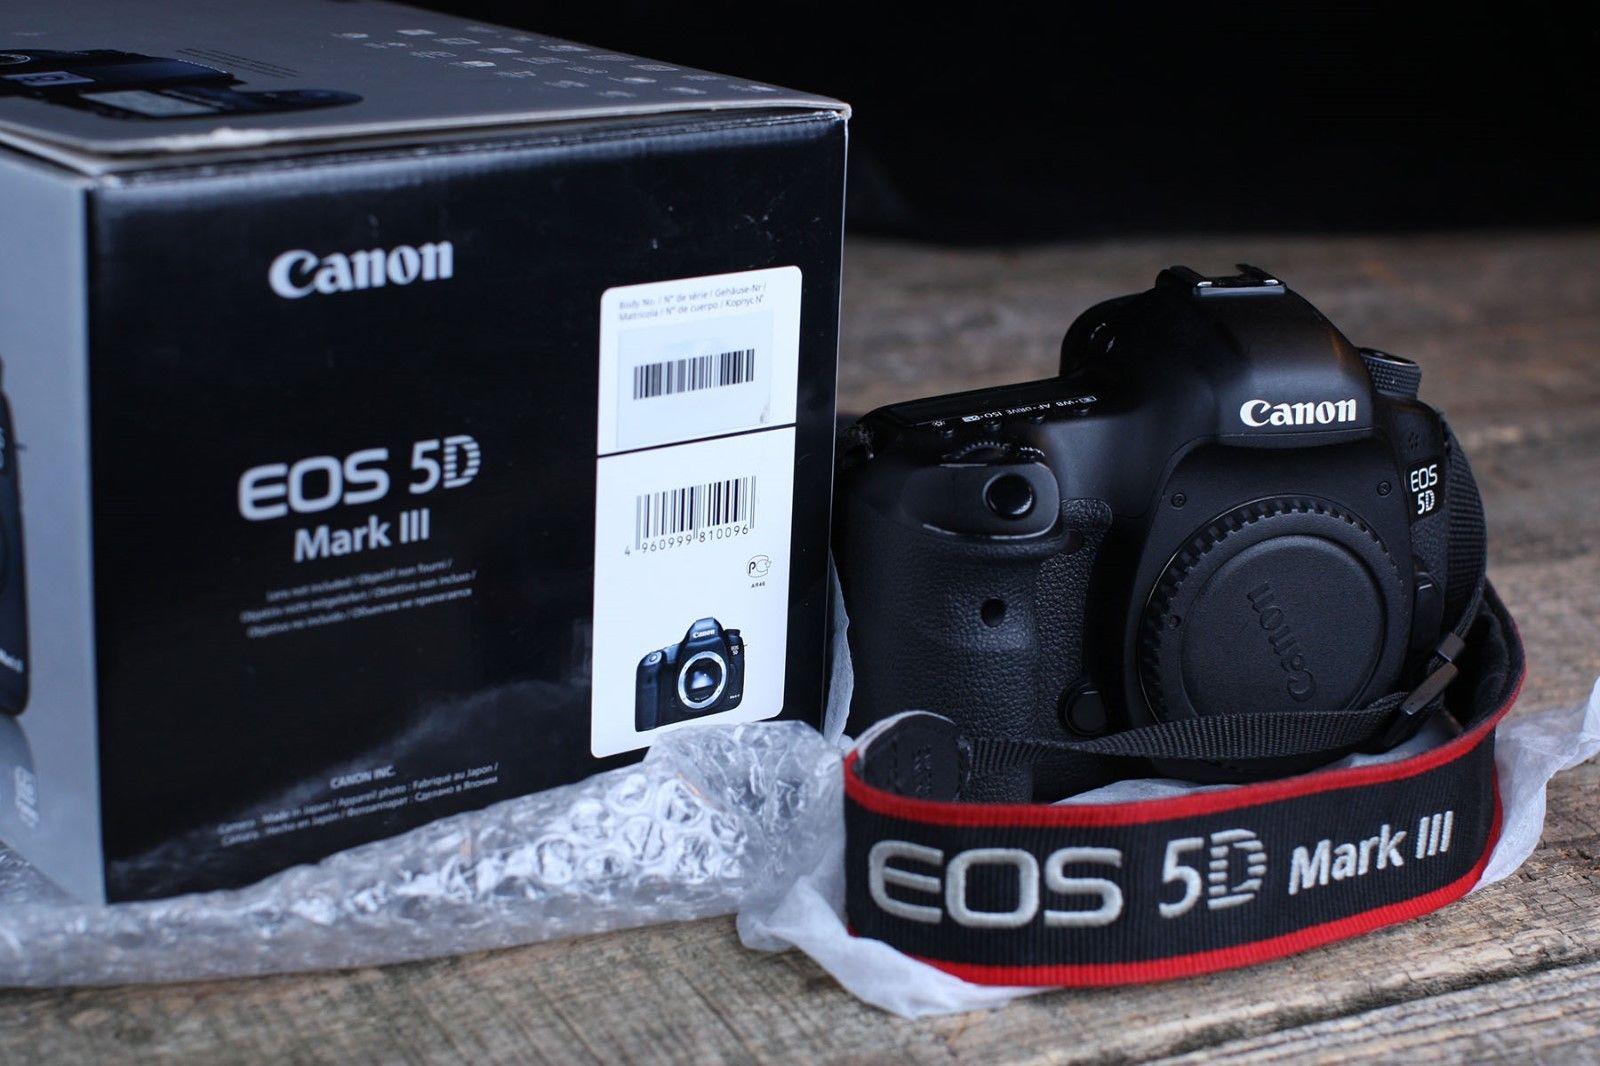 Canon EOS 5D Mark III 22.3MP Digitalkamera Wie Neue !!!